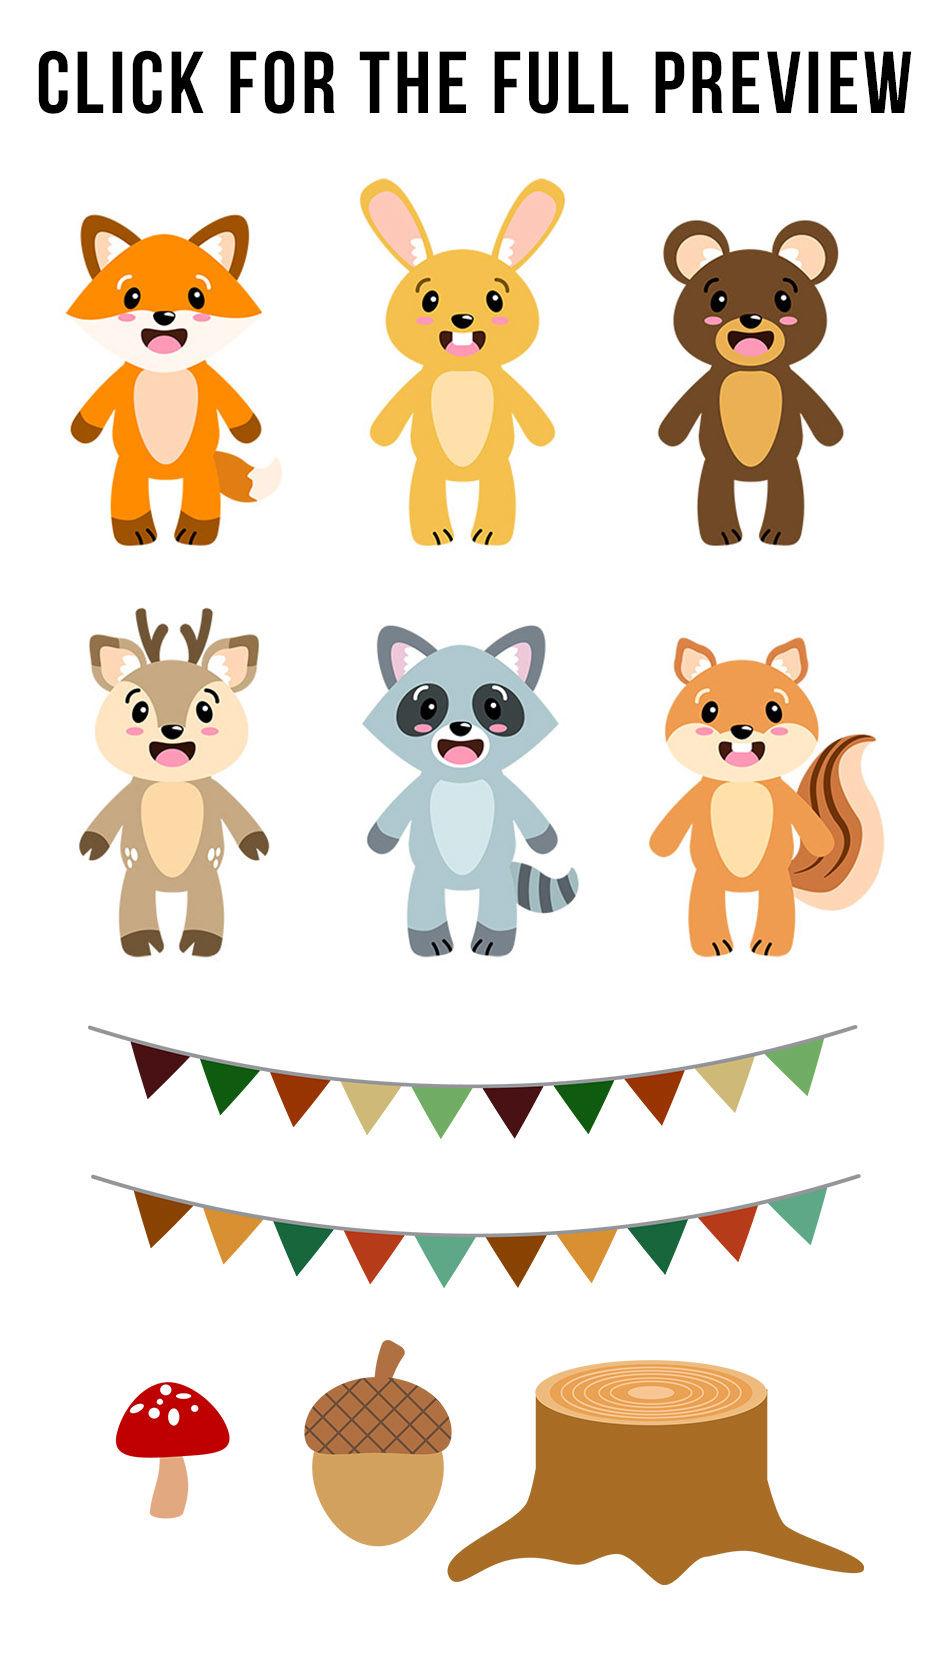 Nursery clipart cute. Woodland animals forest animal